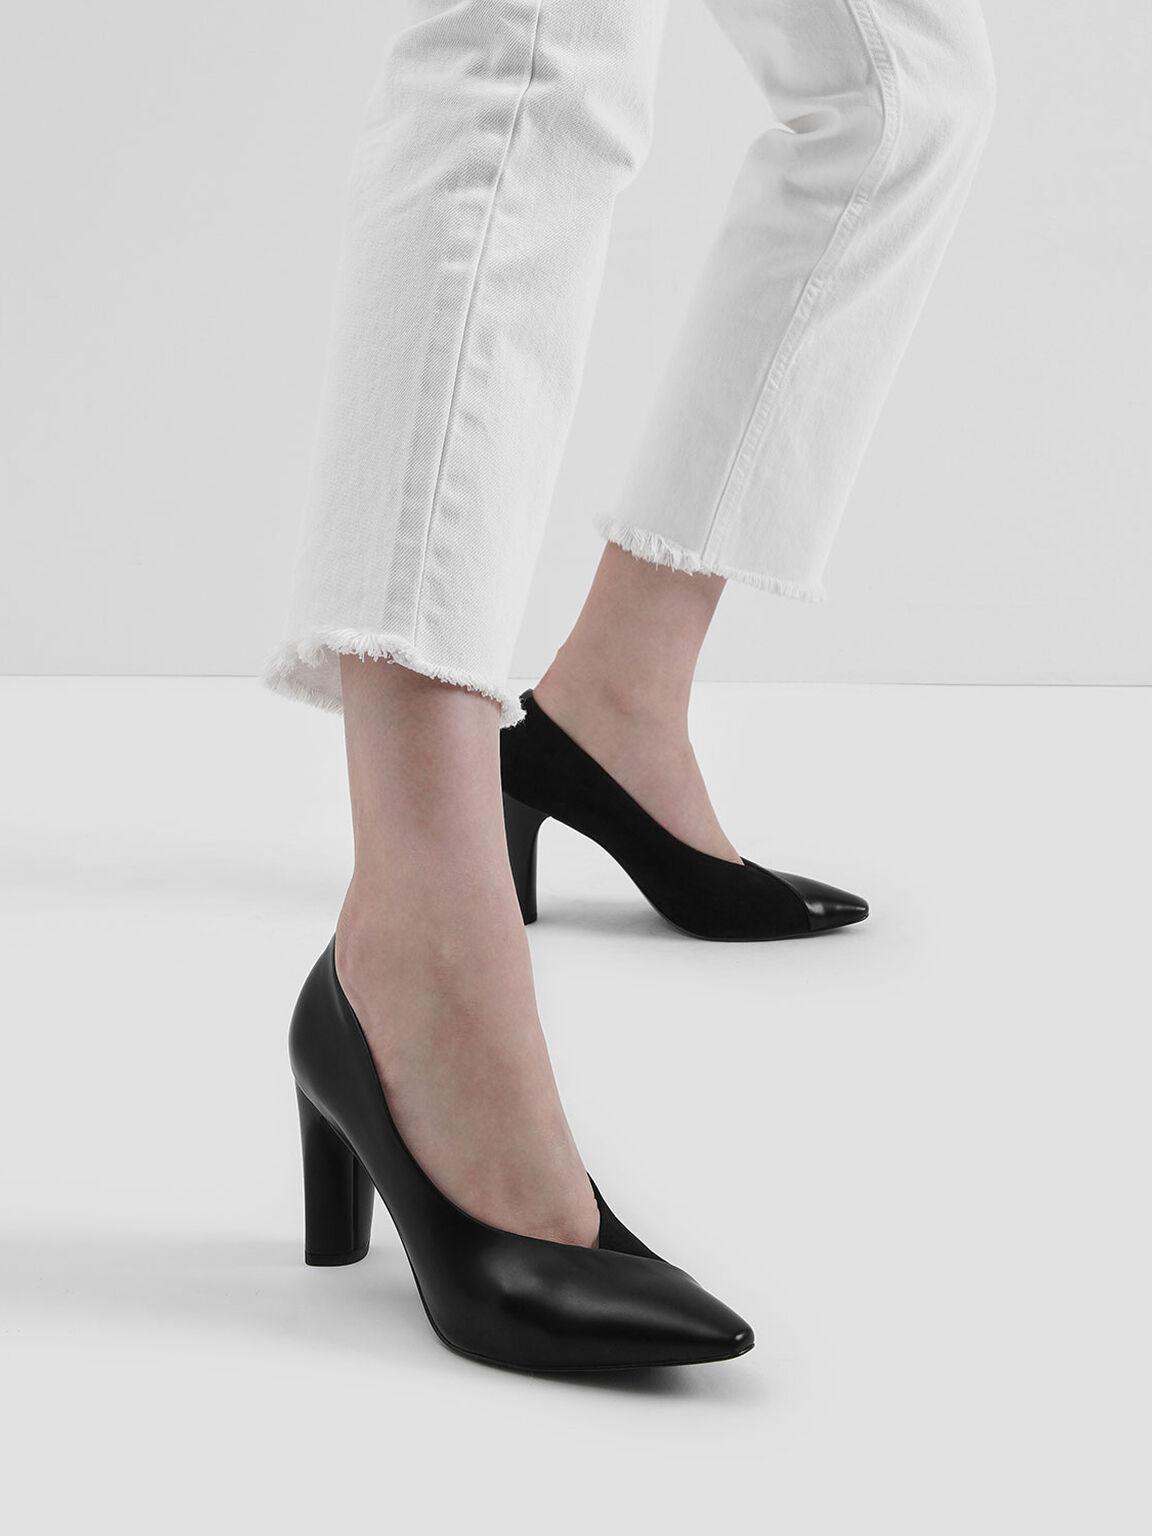 Textured Cylindrical Heel Pumps, Black, hi-res